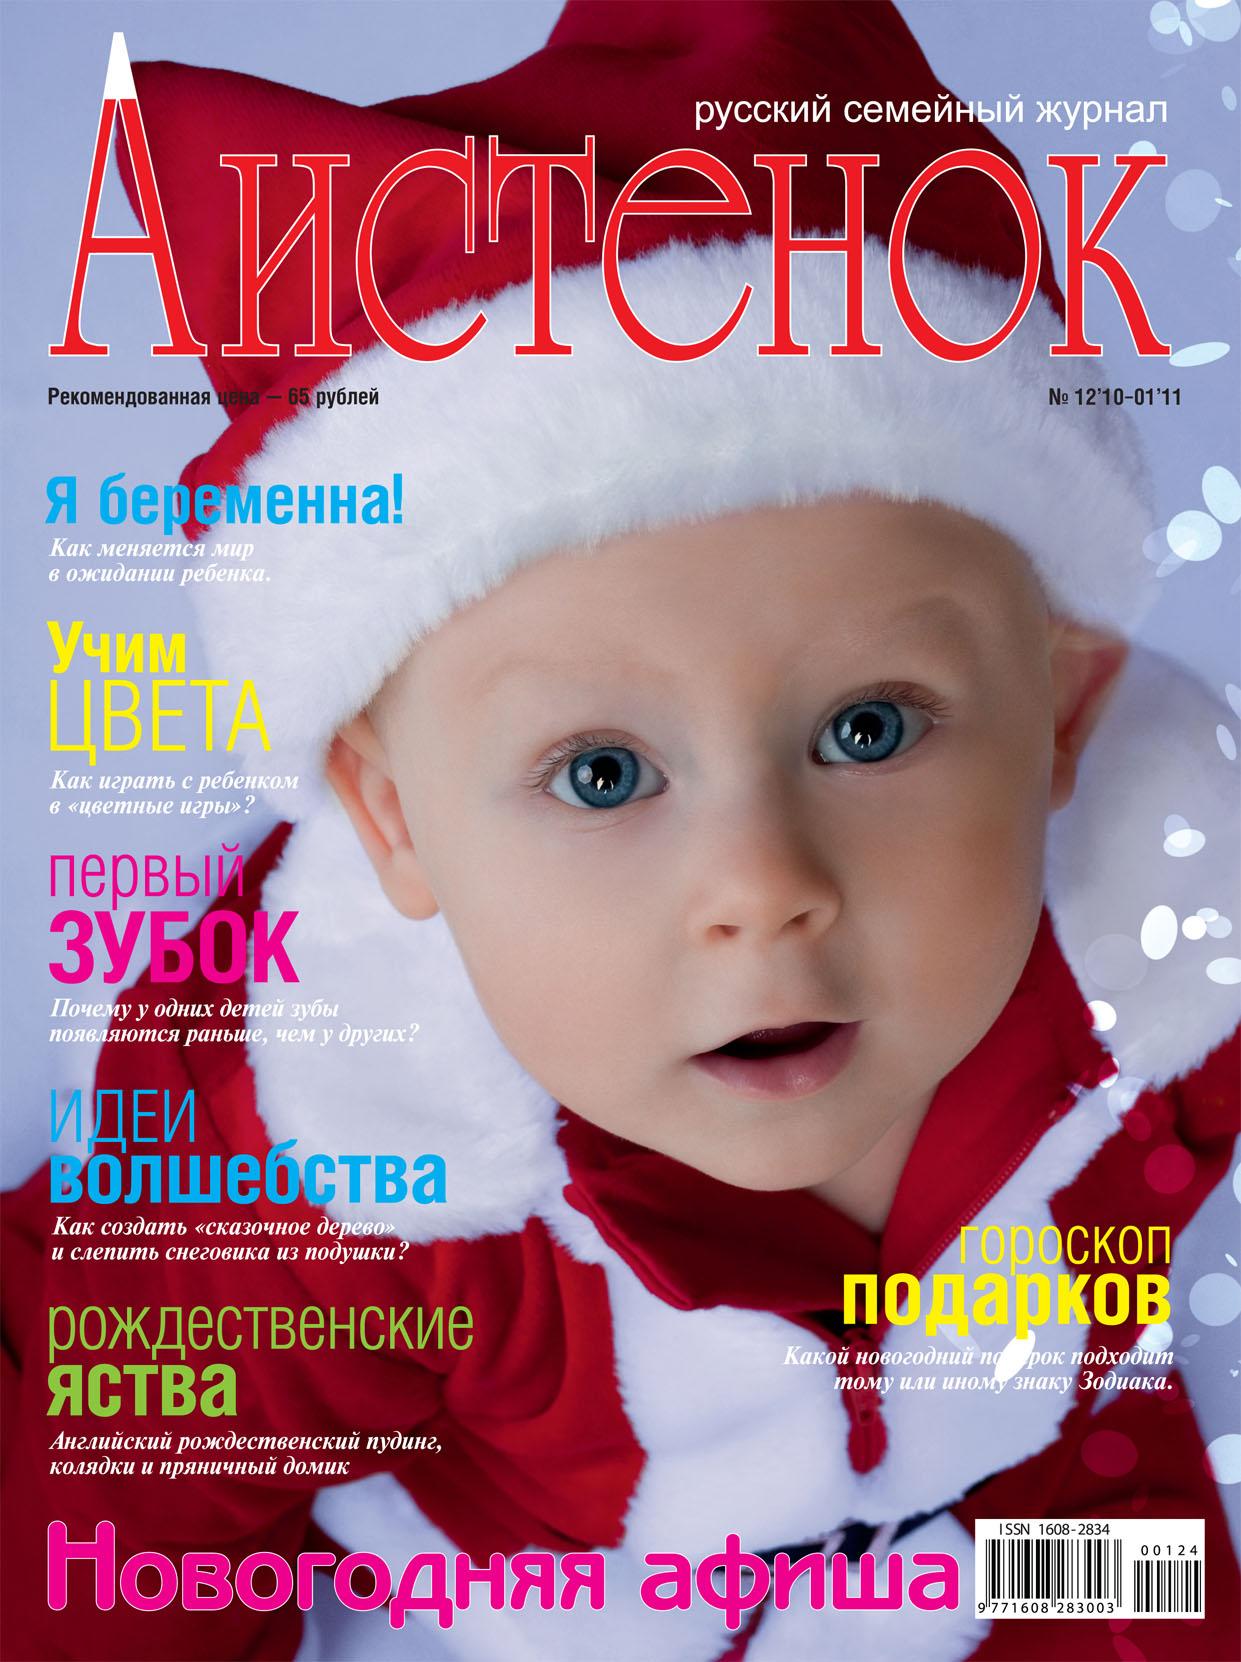 Конкурс фото ребенка на обложку журнала